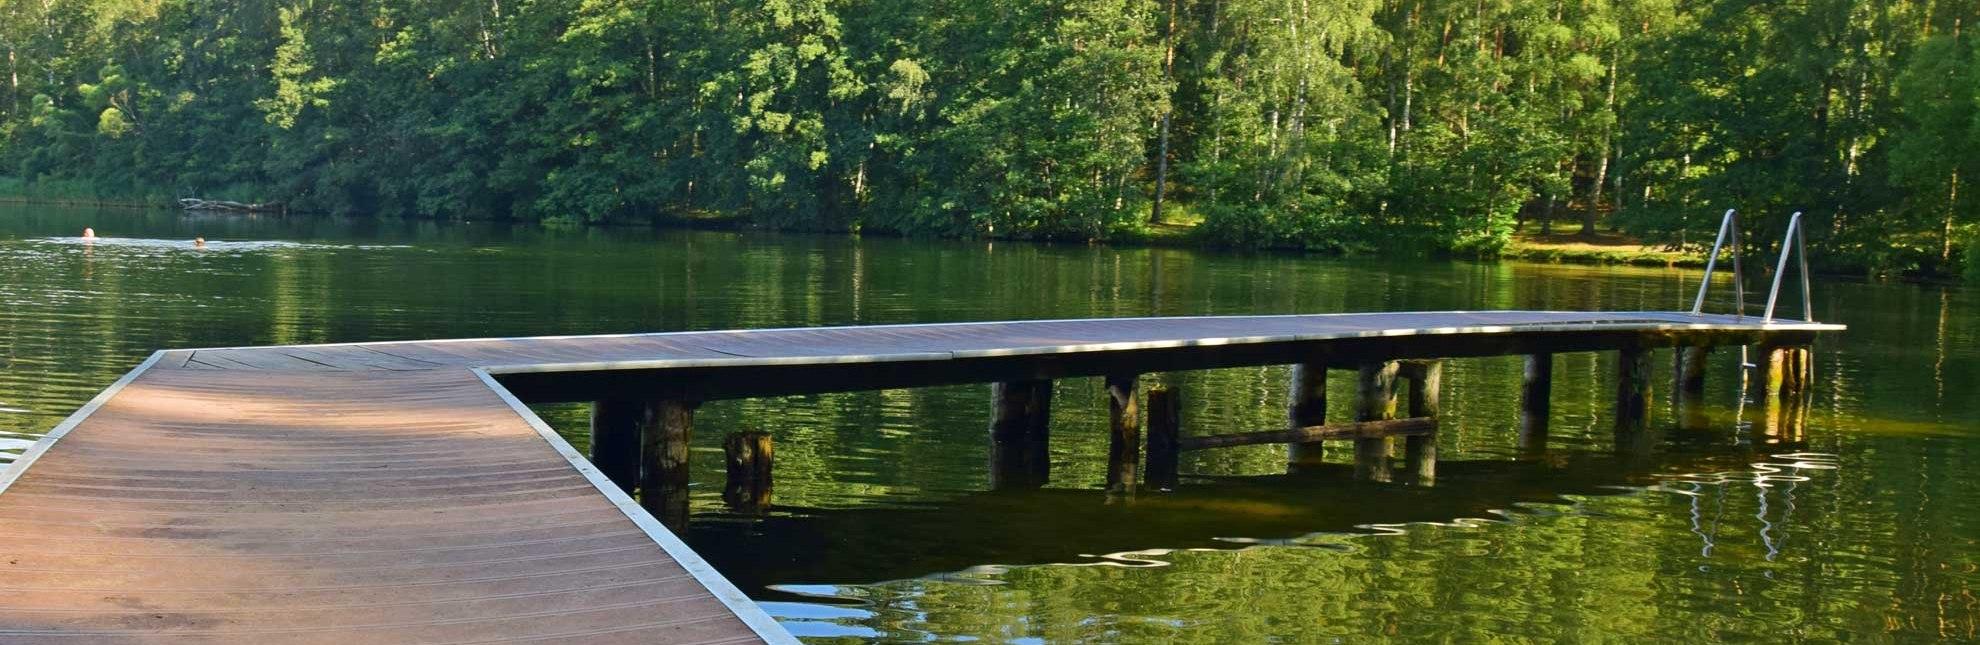 Steg am Pipersee, © Natascha Pätzold